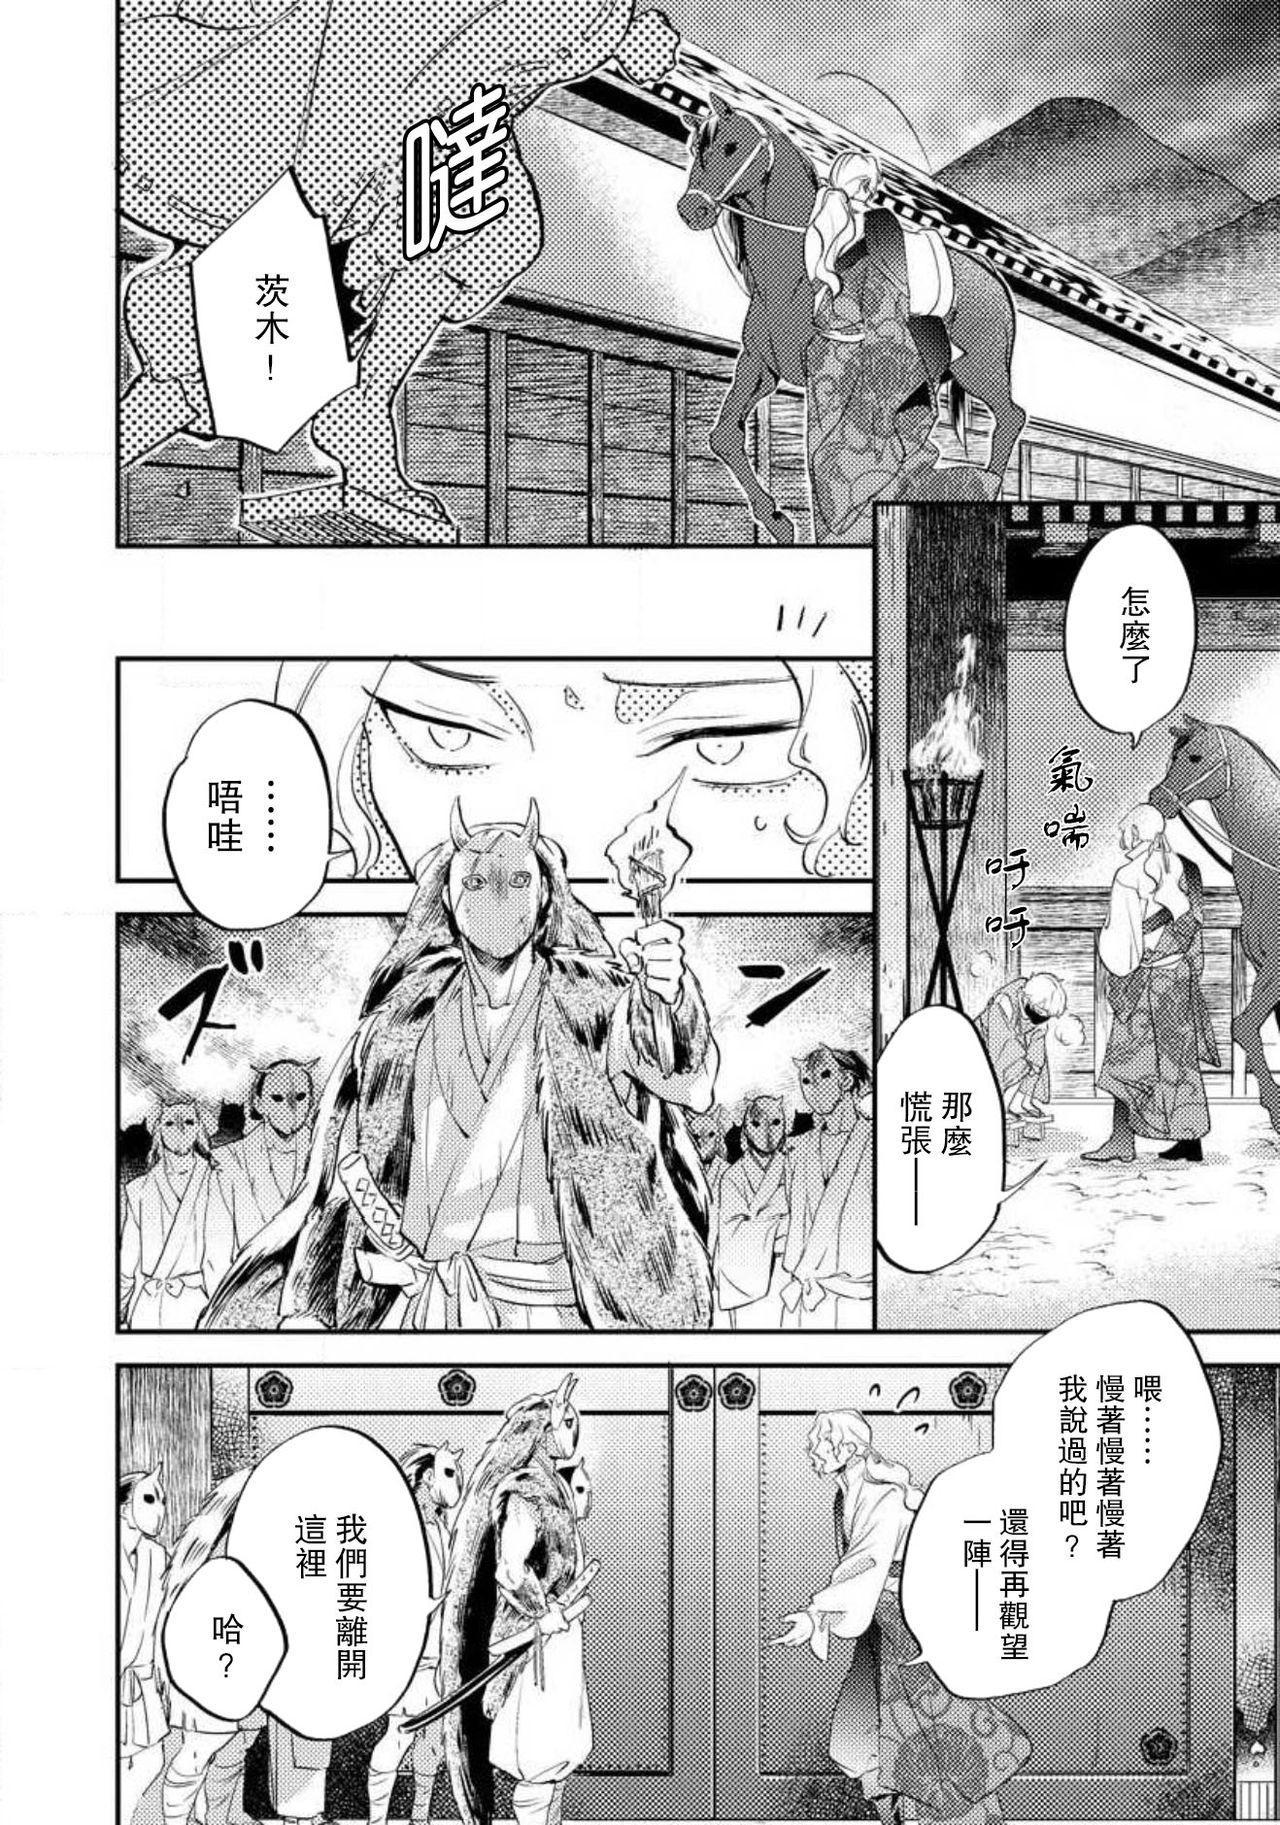 Oeyama suimutan utsukushiki oni no toraware hime | 大江山醉夢逸話 美麗的鬼與被囚禁的公主 Ch. 1-8 163